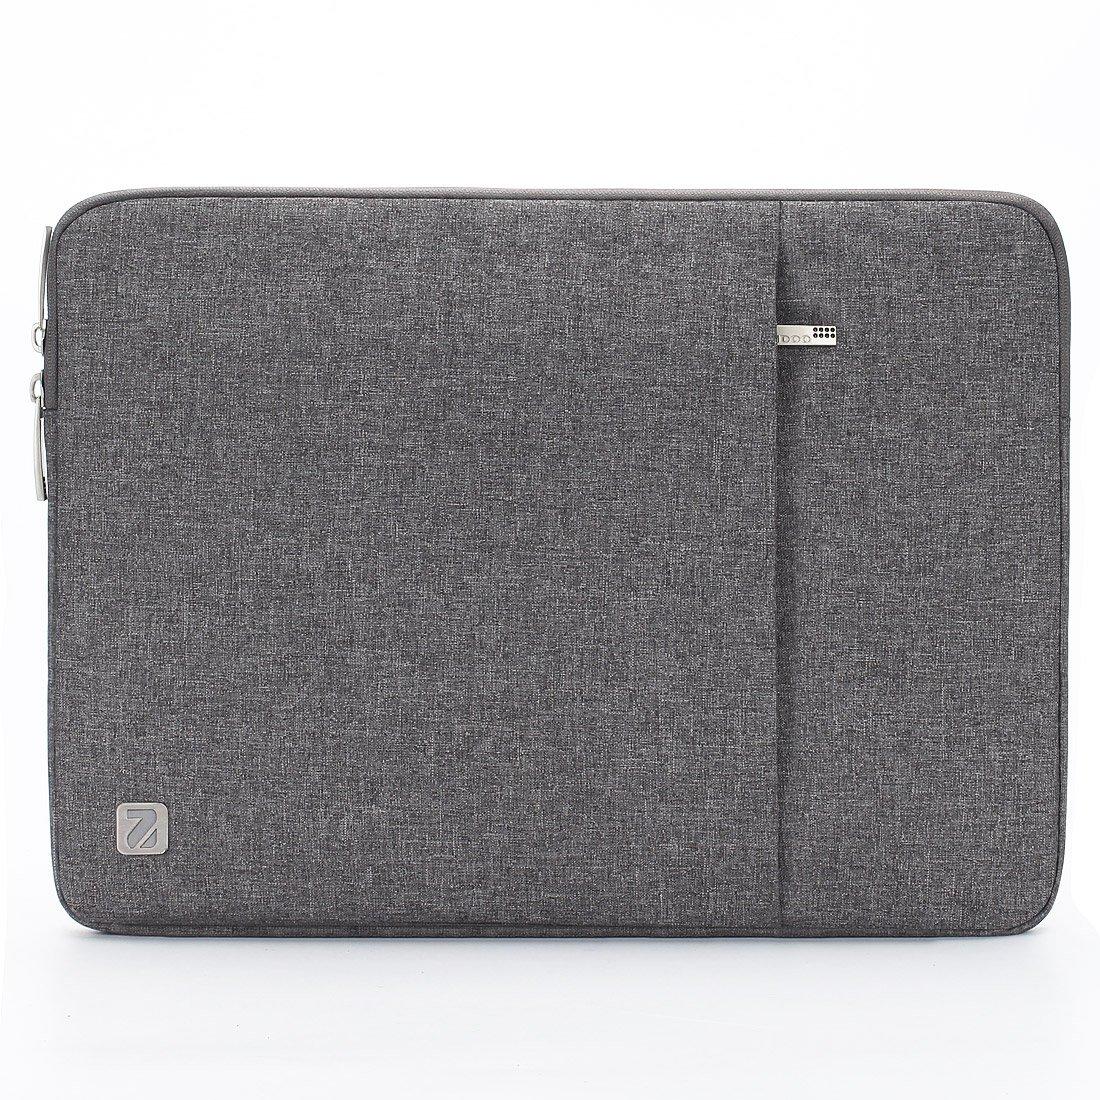 HP ProBook 645 G4 //15.6 Lenovo Thinkpad T590 Lenovo ThinkPad A485 E485 E490 T480s Bleu NIDOO 14 Pouces Imperm/éable Housse Protection Ordinateur Portable pour 14 Lenovo Chromebook S330